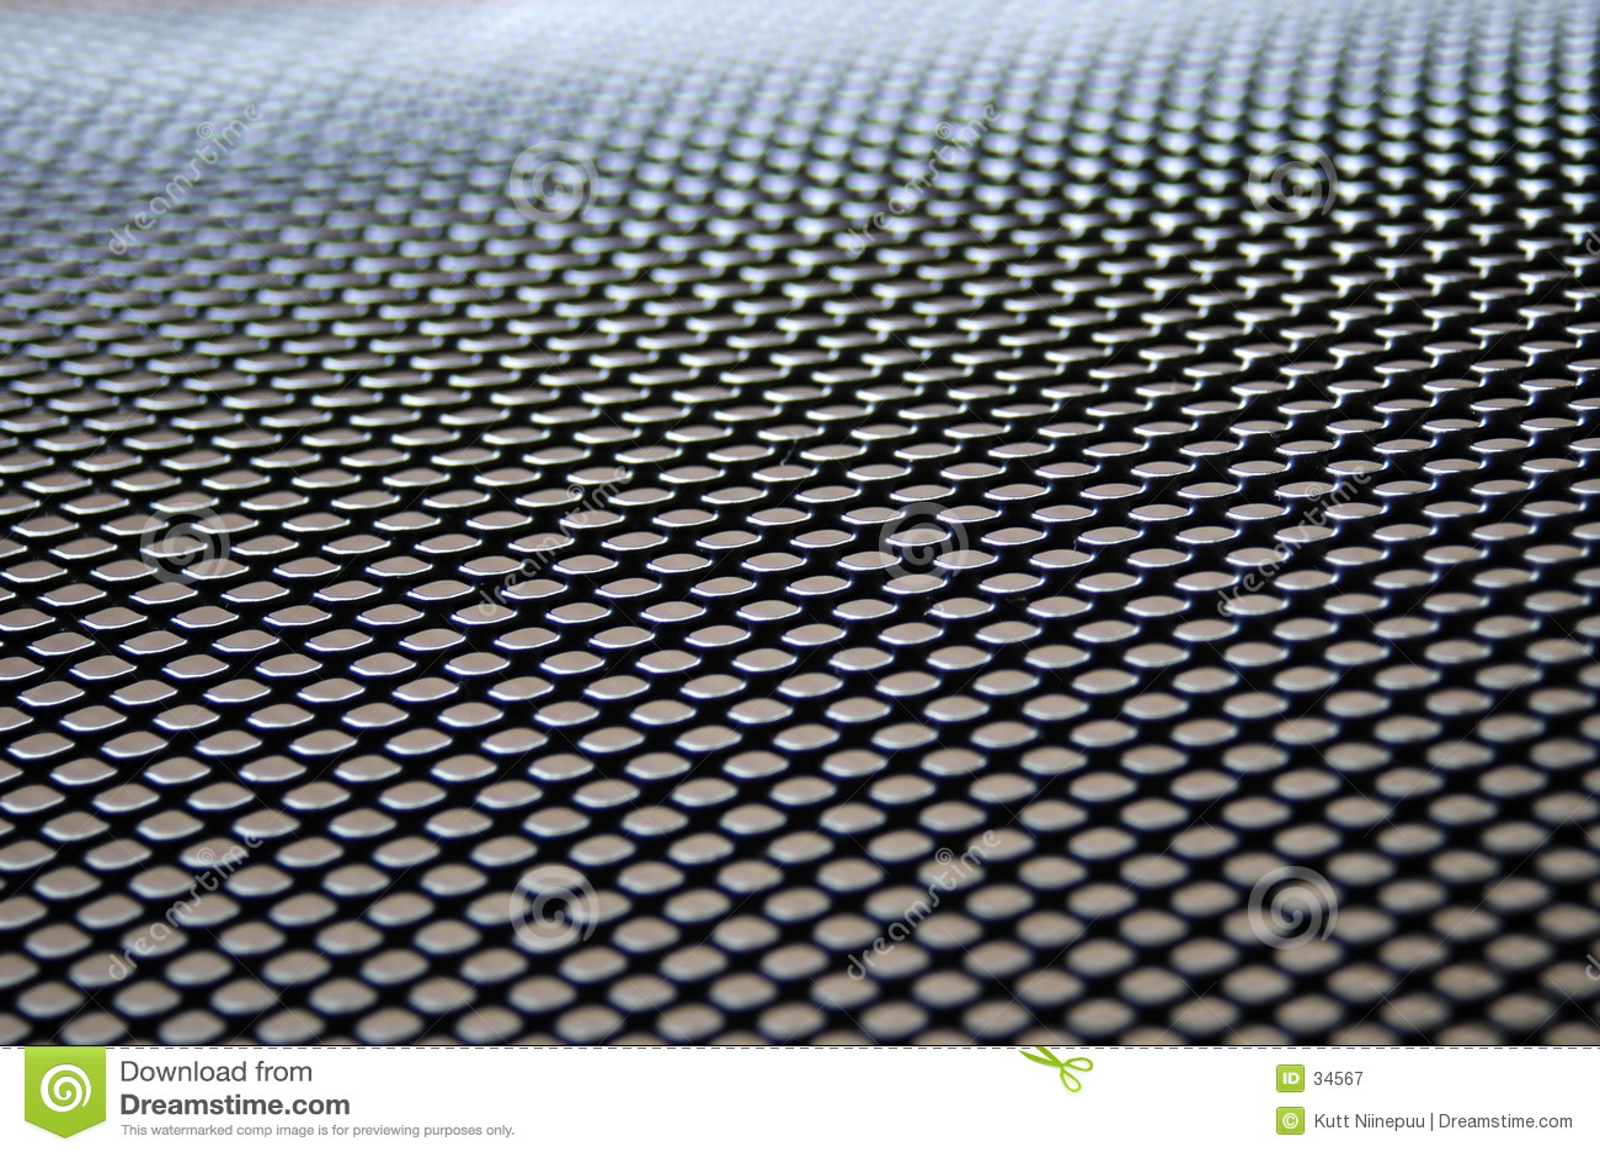 Steel mesh trashbin 2